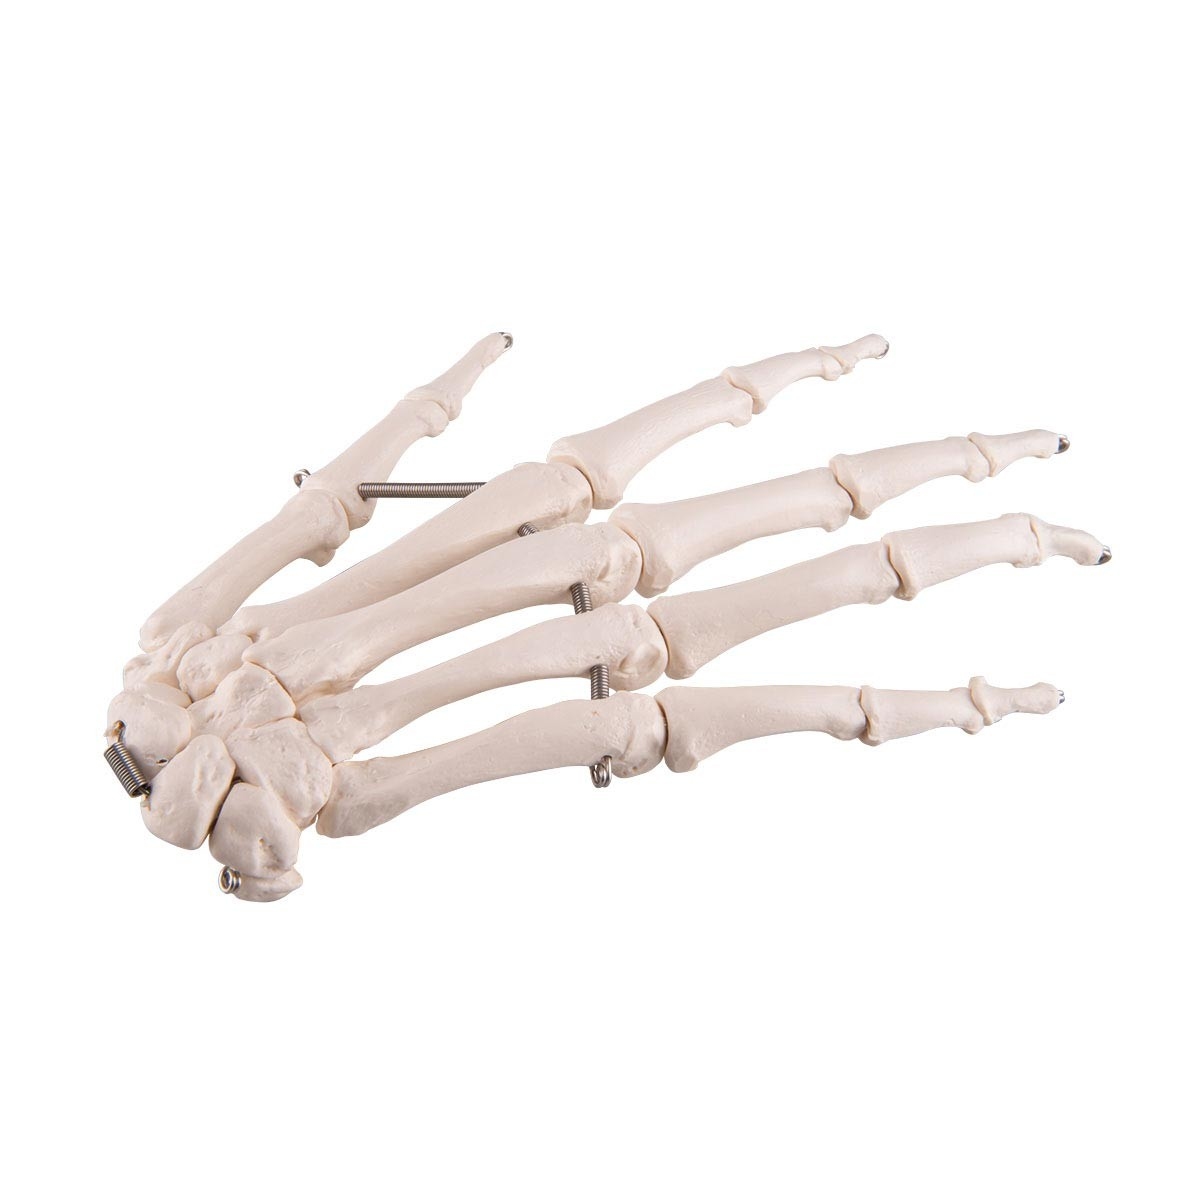 Handskelett auf Draht gezogen